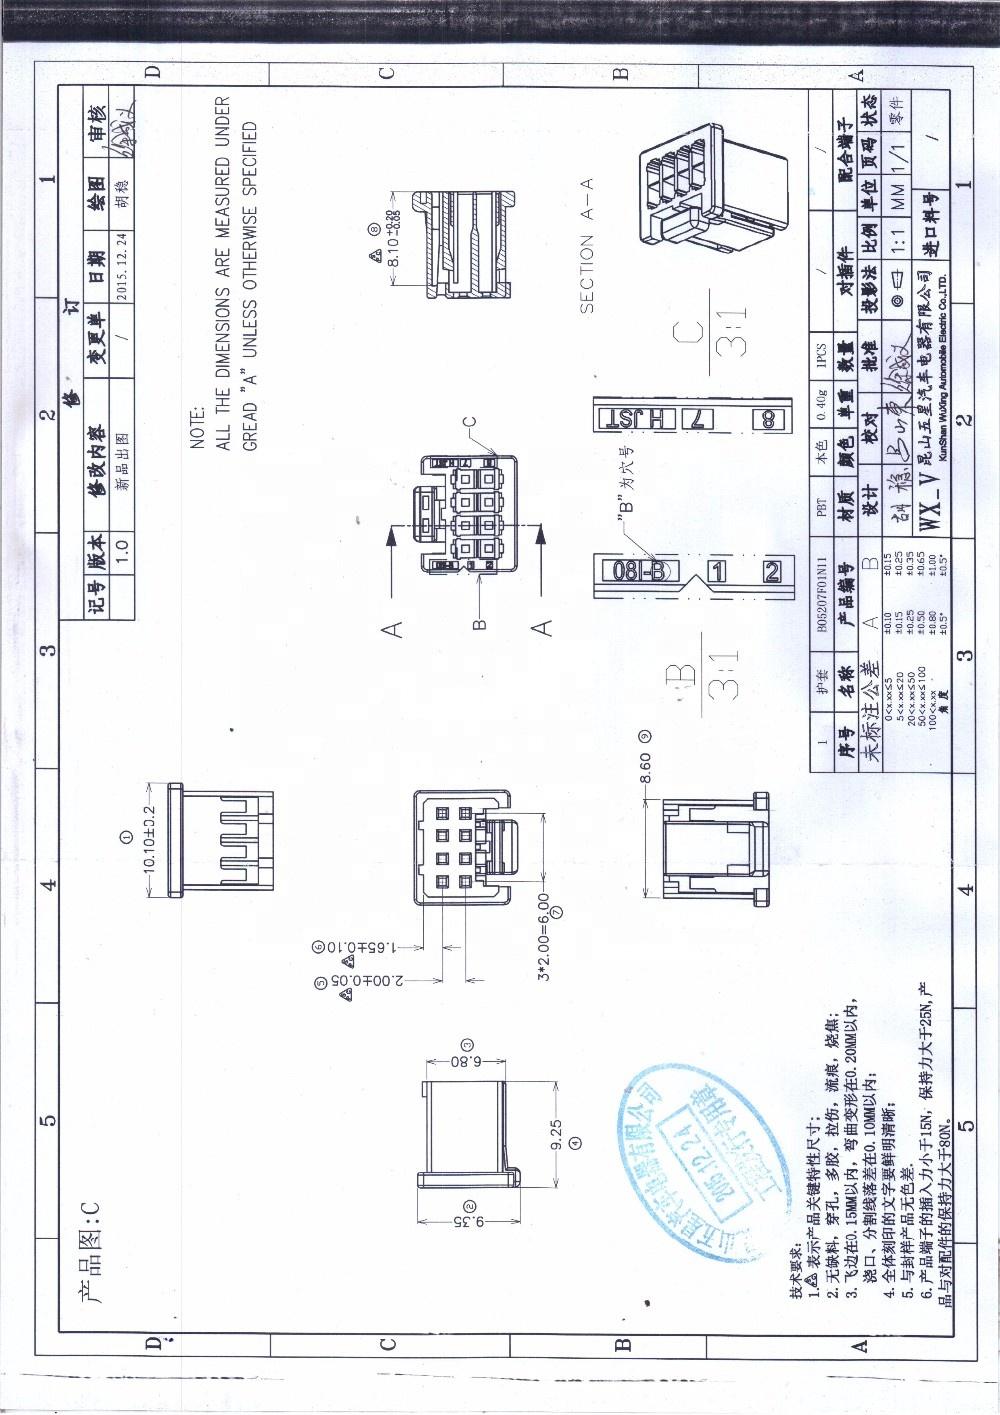 Jst 2,0 мм Шаг PUD серии 8 пиновый Корпус разъема PUDP-08V-S